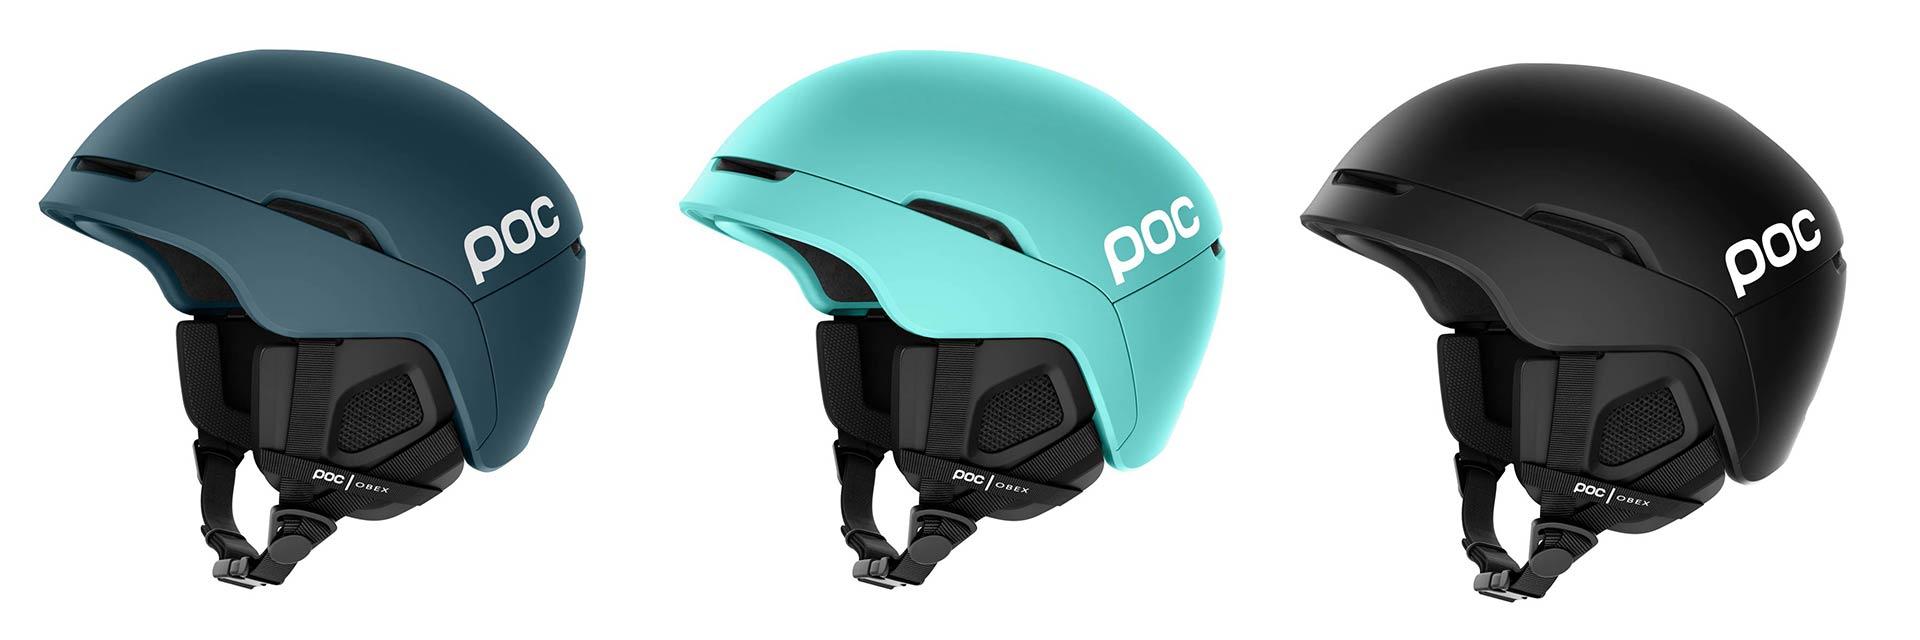 Der POC Obex 18/19 Helm